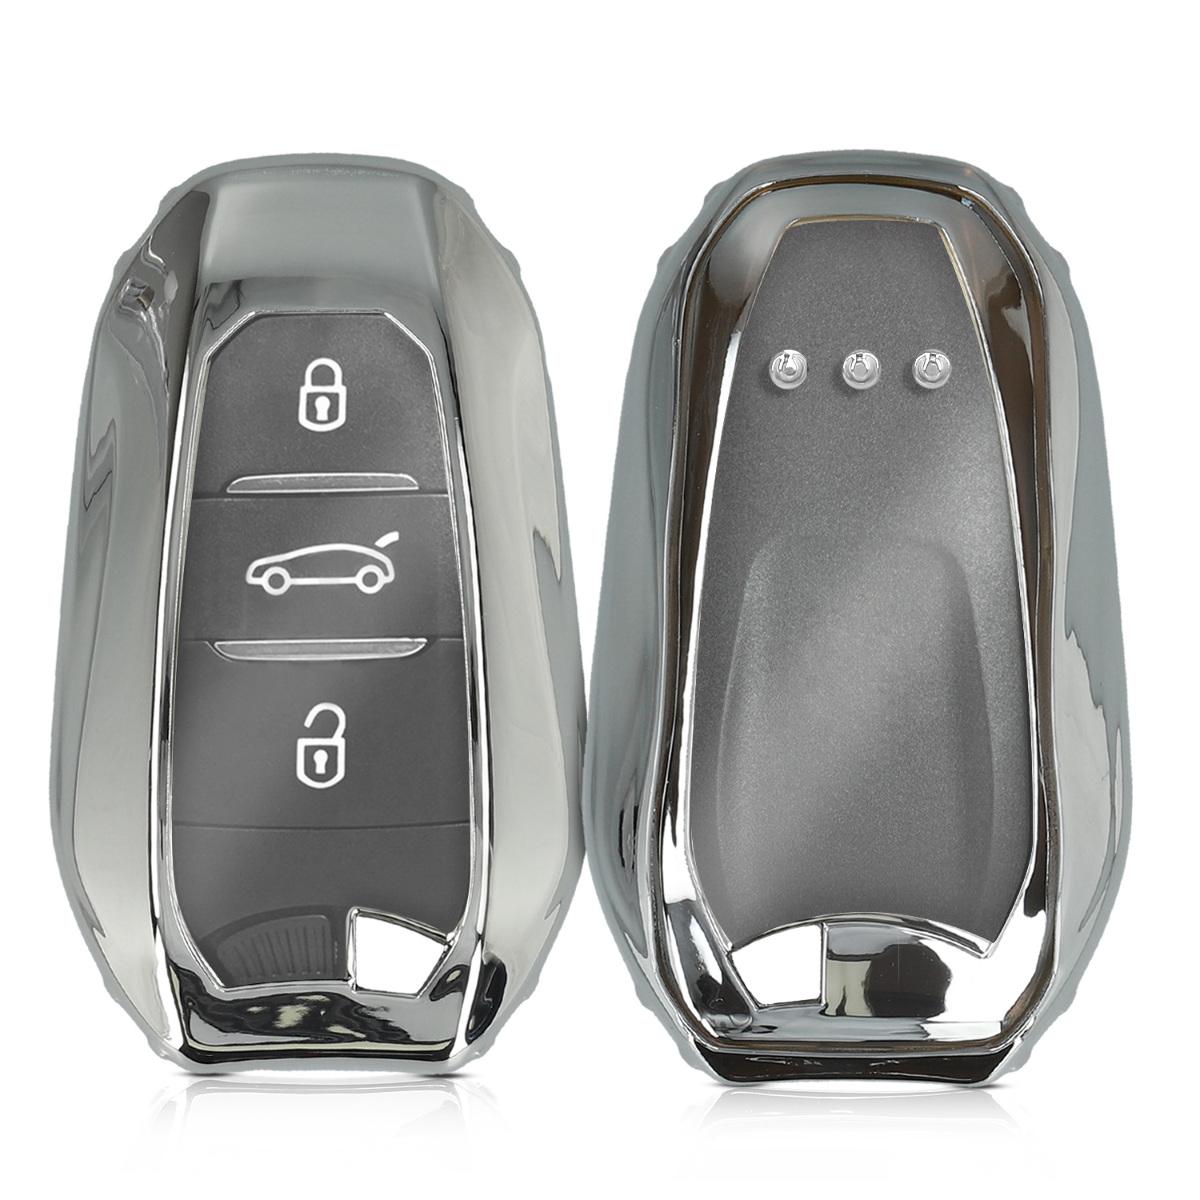 KW Θήκη Κλειδιού Σιλικόνης Peugeot Citroen - 3 Κουμπιά - Silver High Gloss (49071.94)